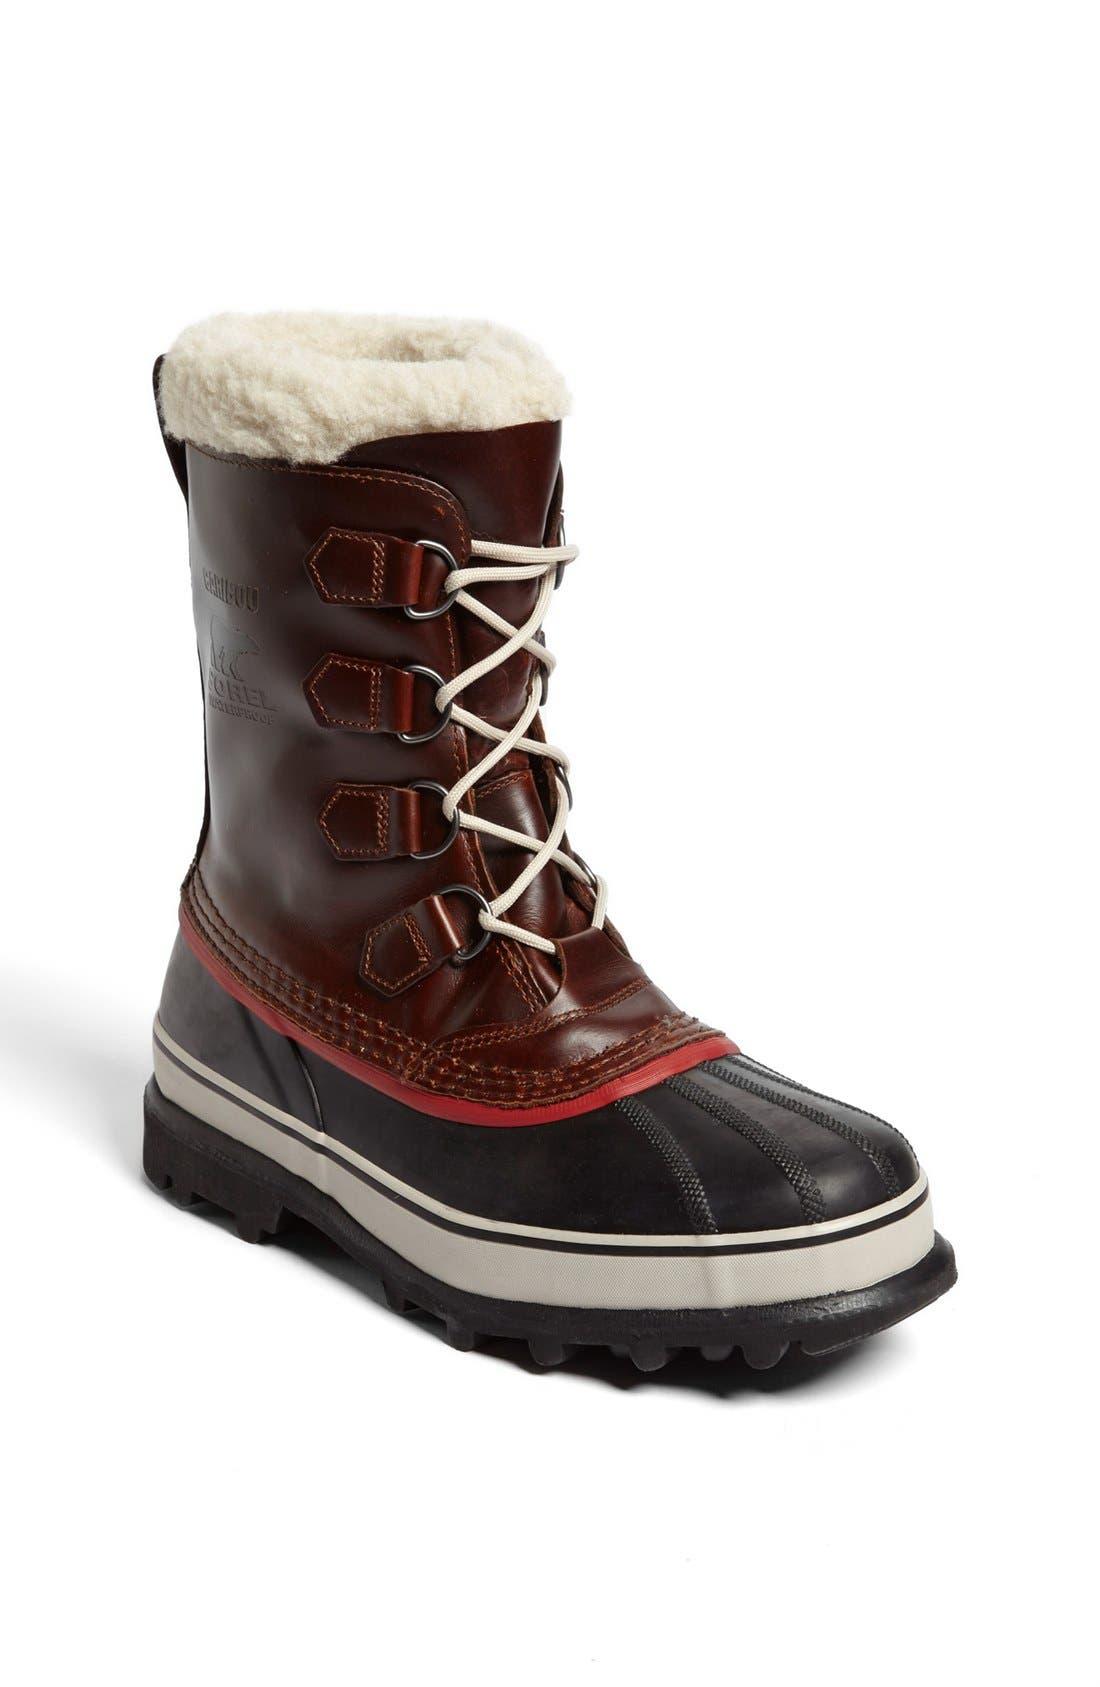 SOREL 'Caribou' Snow Boot, Main, color, 219